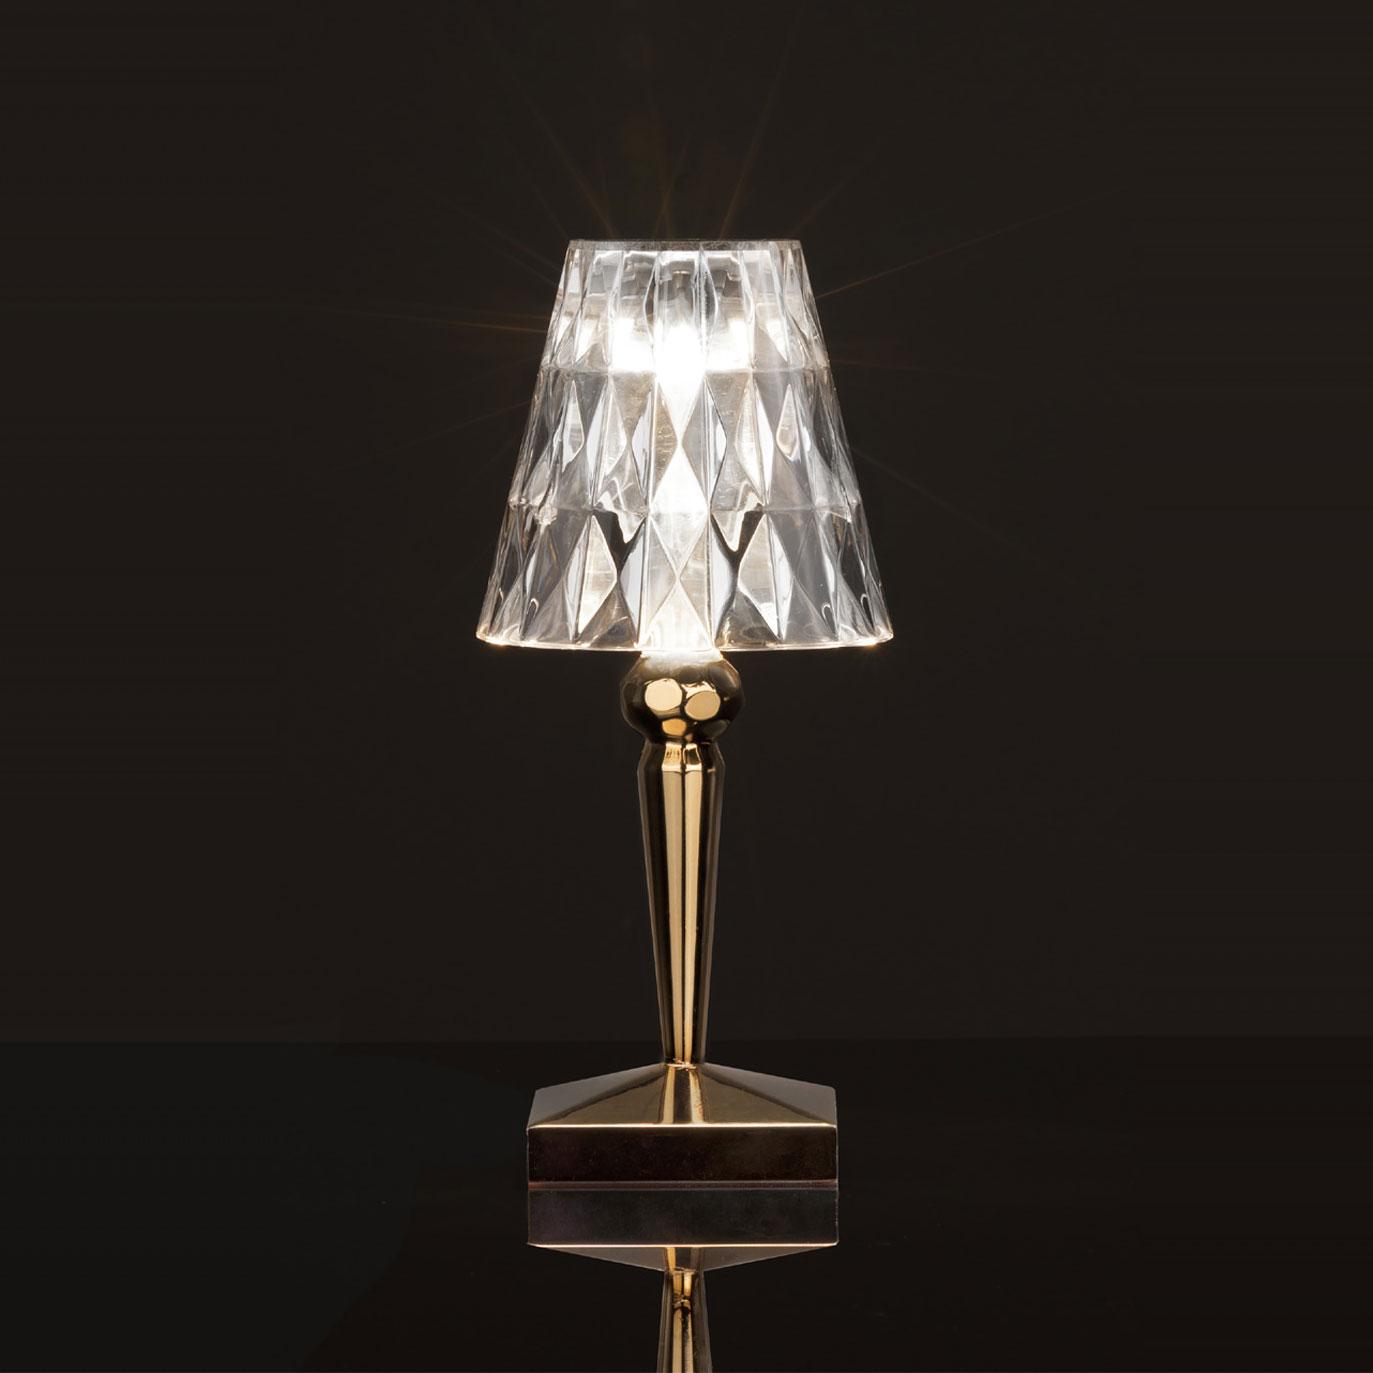 kartell battery table lamp metallic rechargeable by ferruccio laviani battery table lamps ferruccio laviani